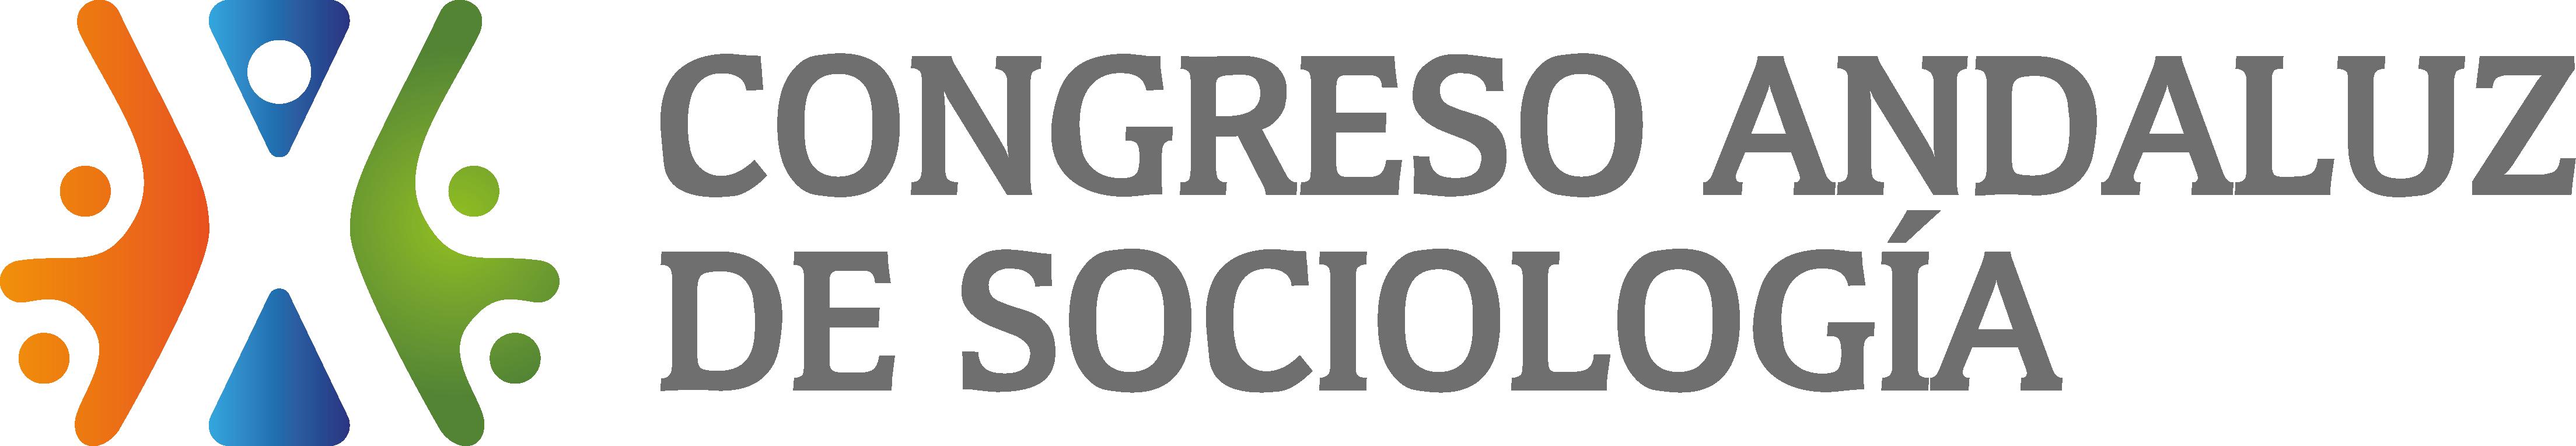 X Congreso Andaluz de Sociología - Congreso Virtual en Línea